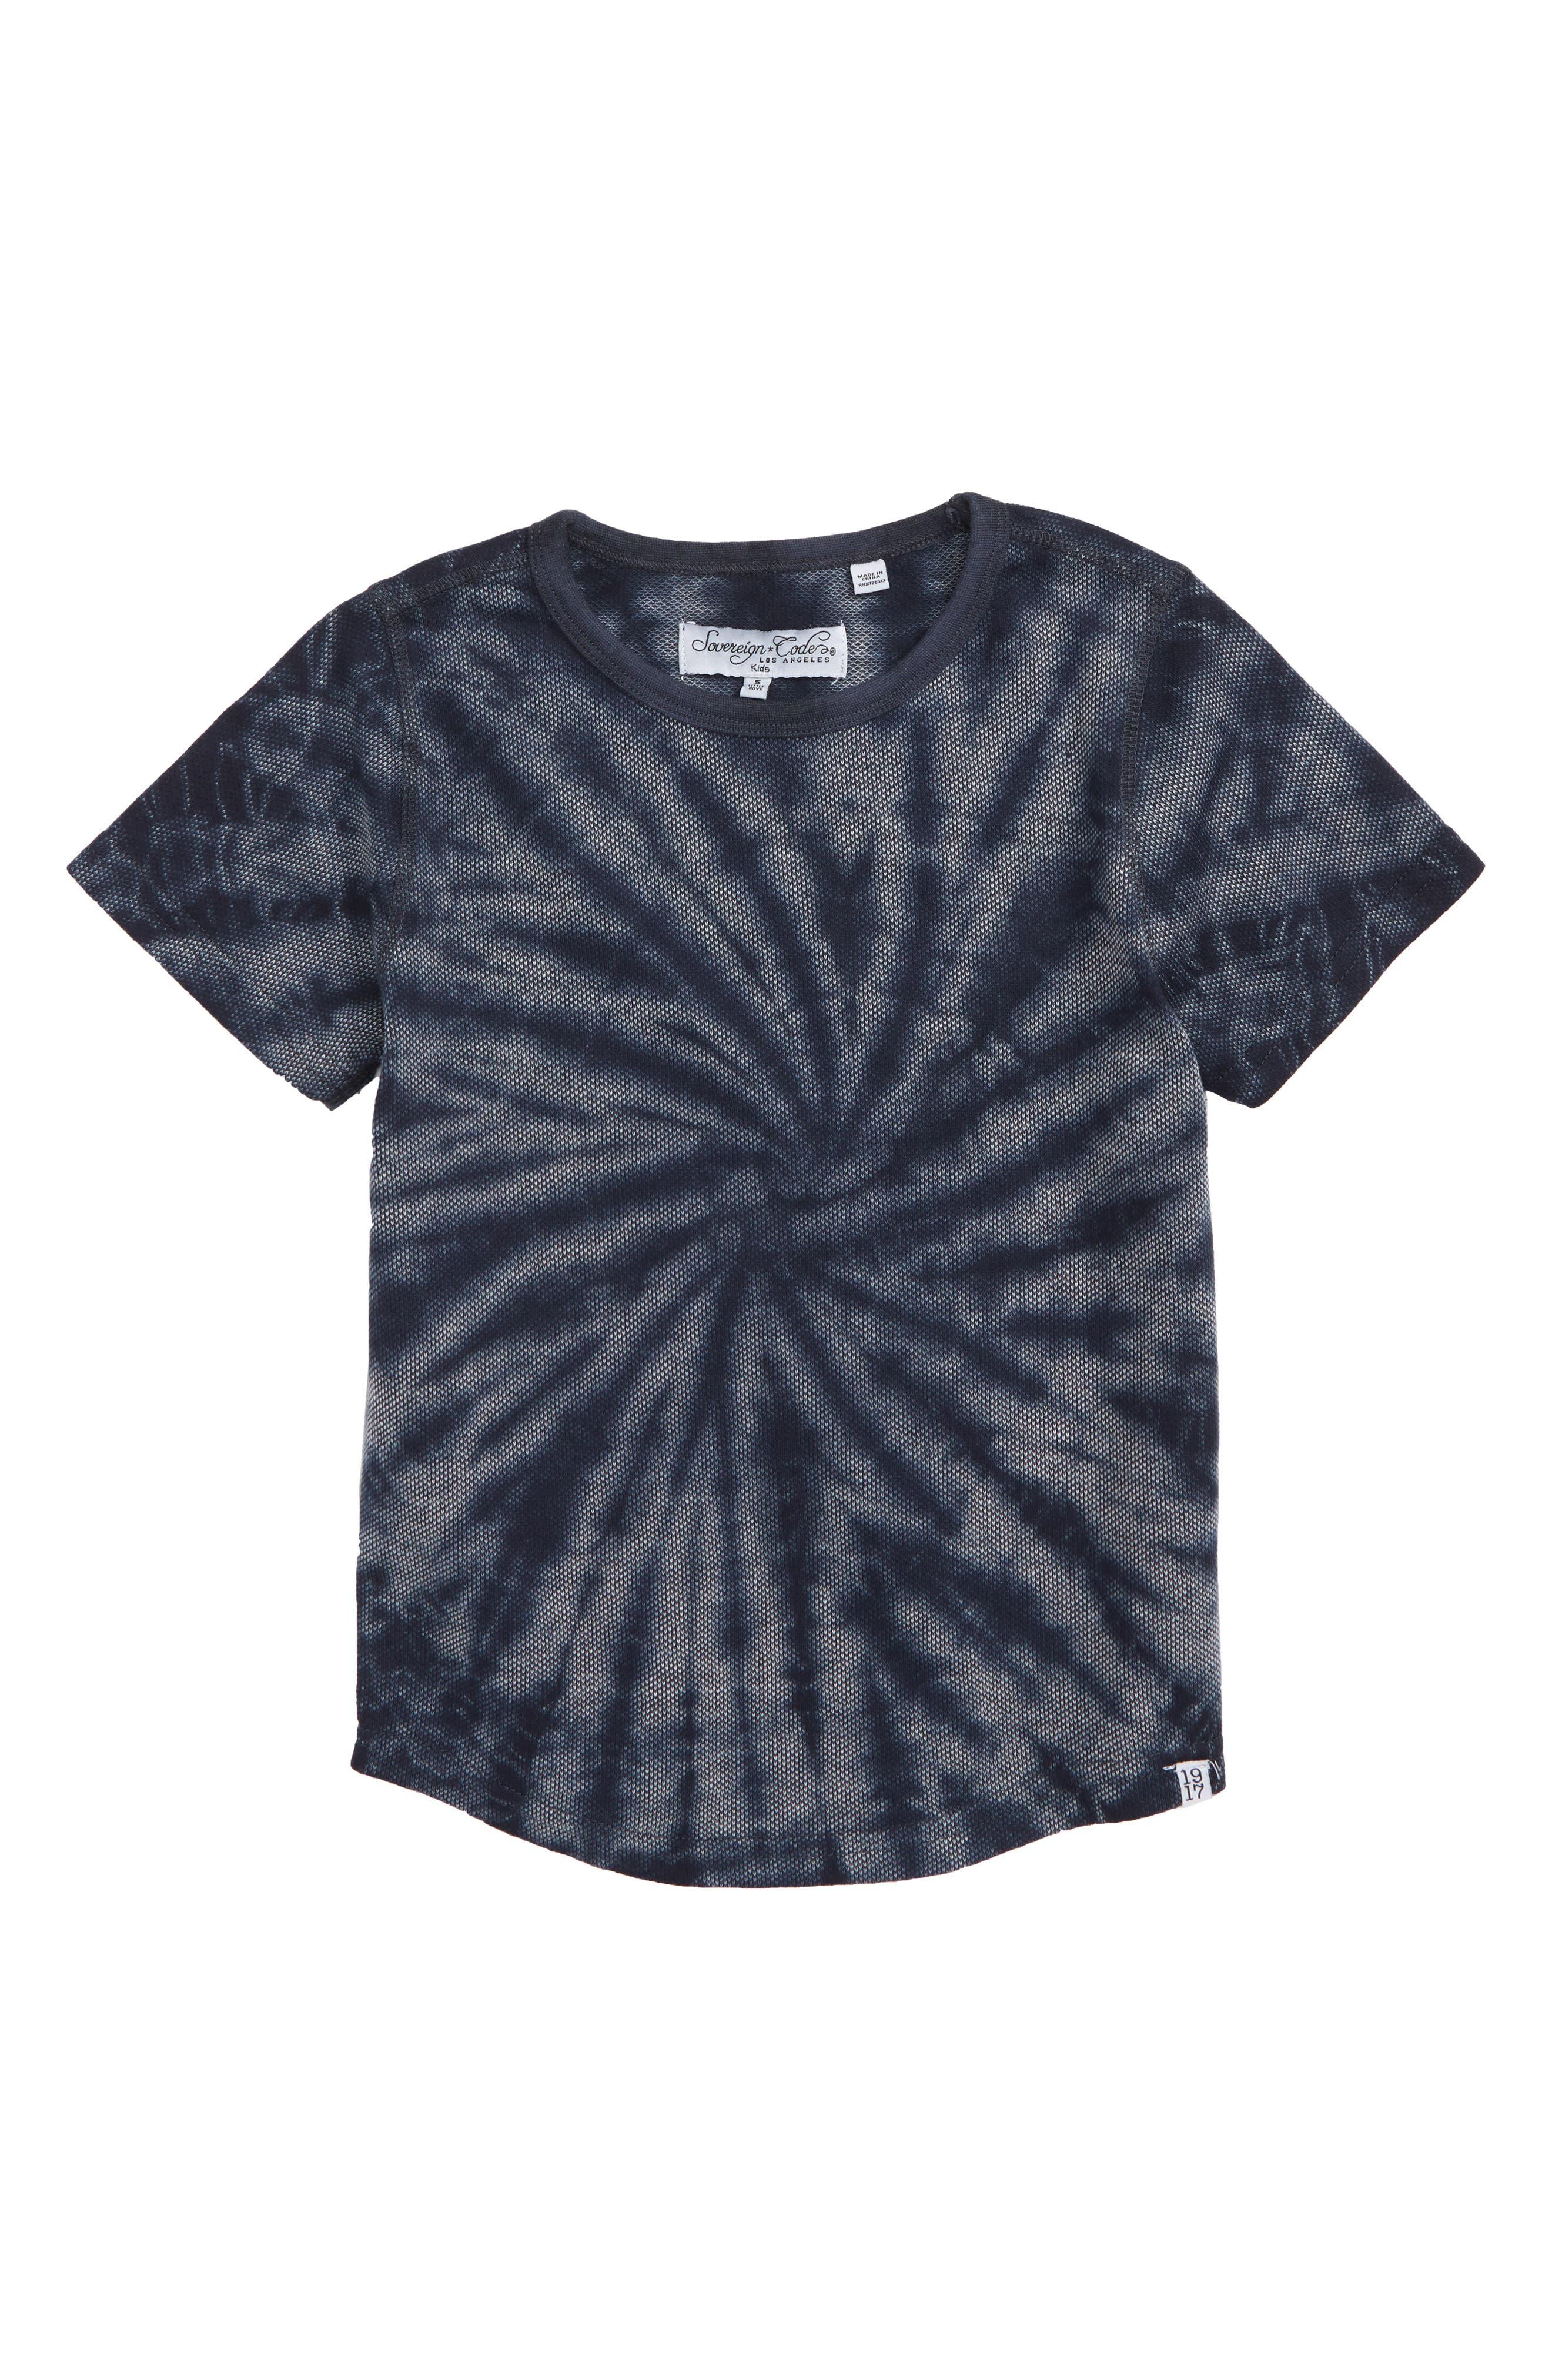 Tourist Tie Dye T-Shirt,                             Main thumbnail 1, color,                             NAVY